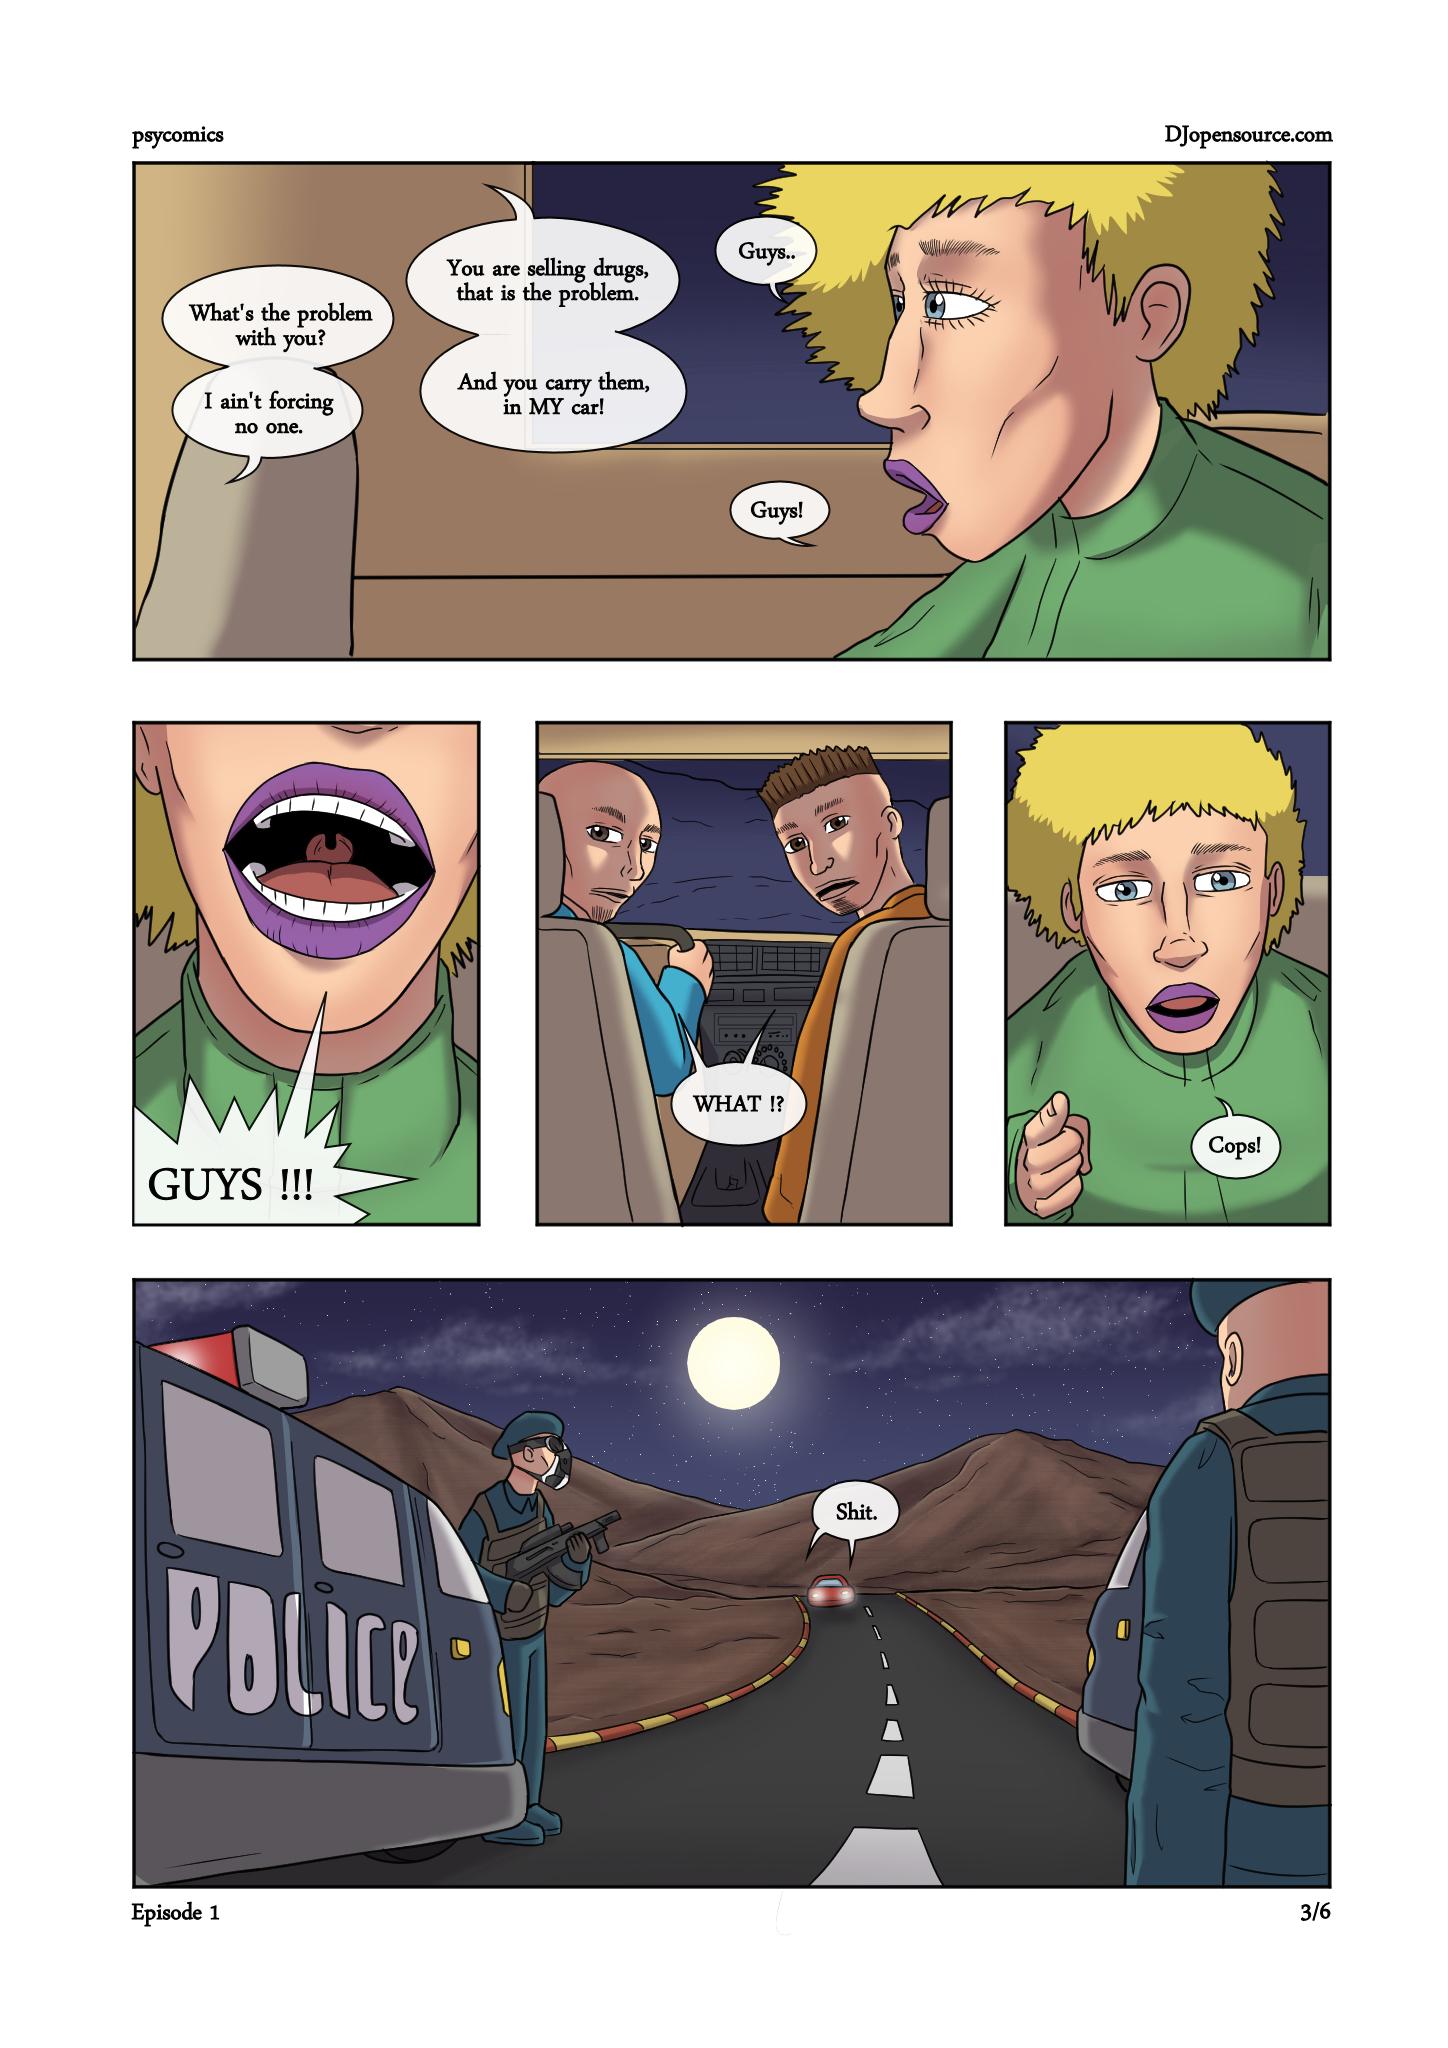 psycomics_episode_1_page_3.jpg